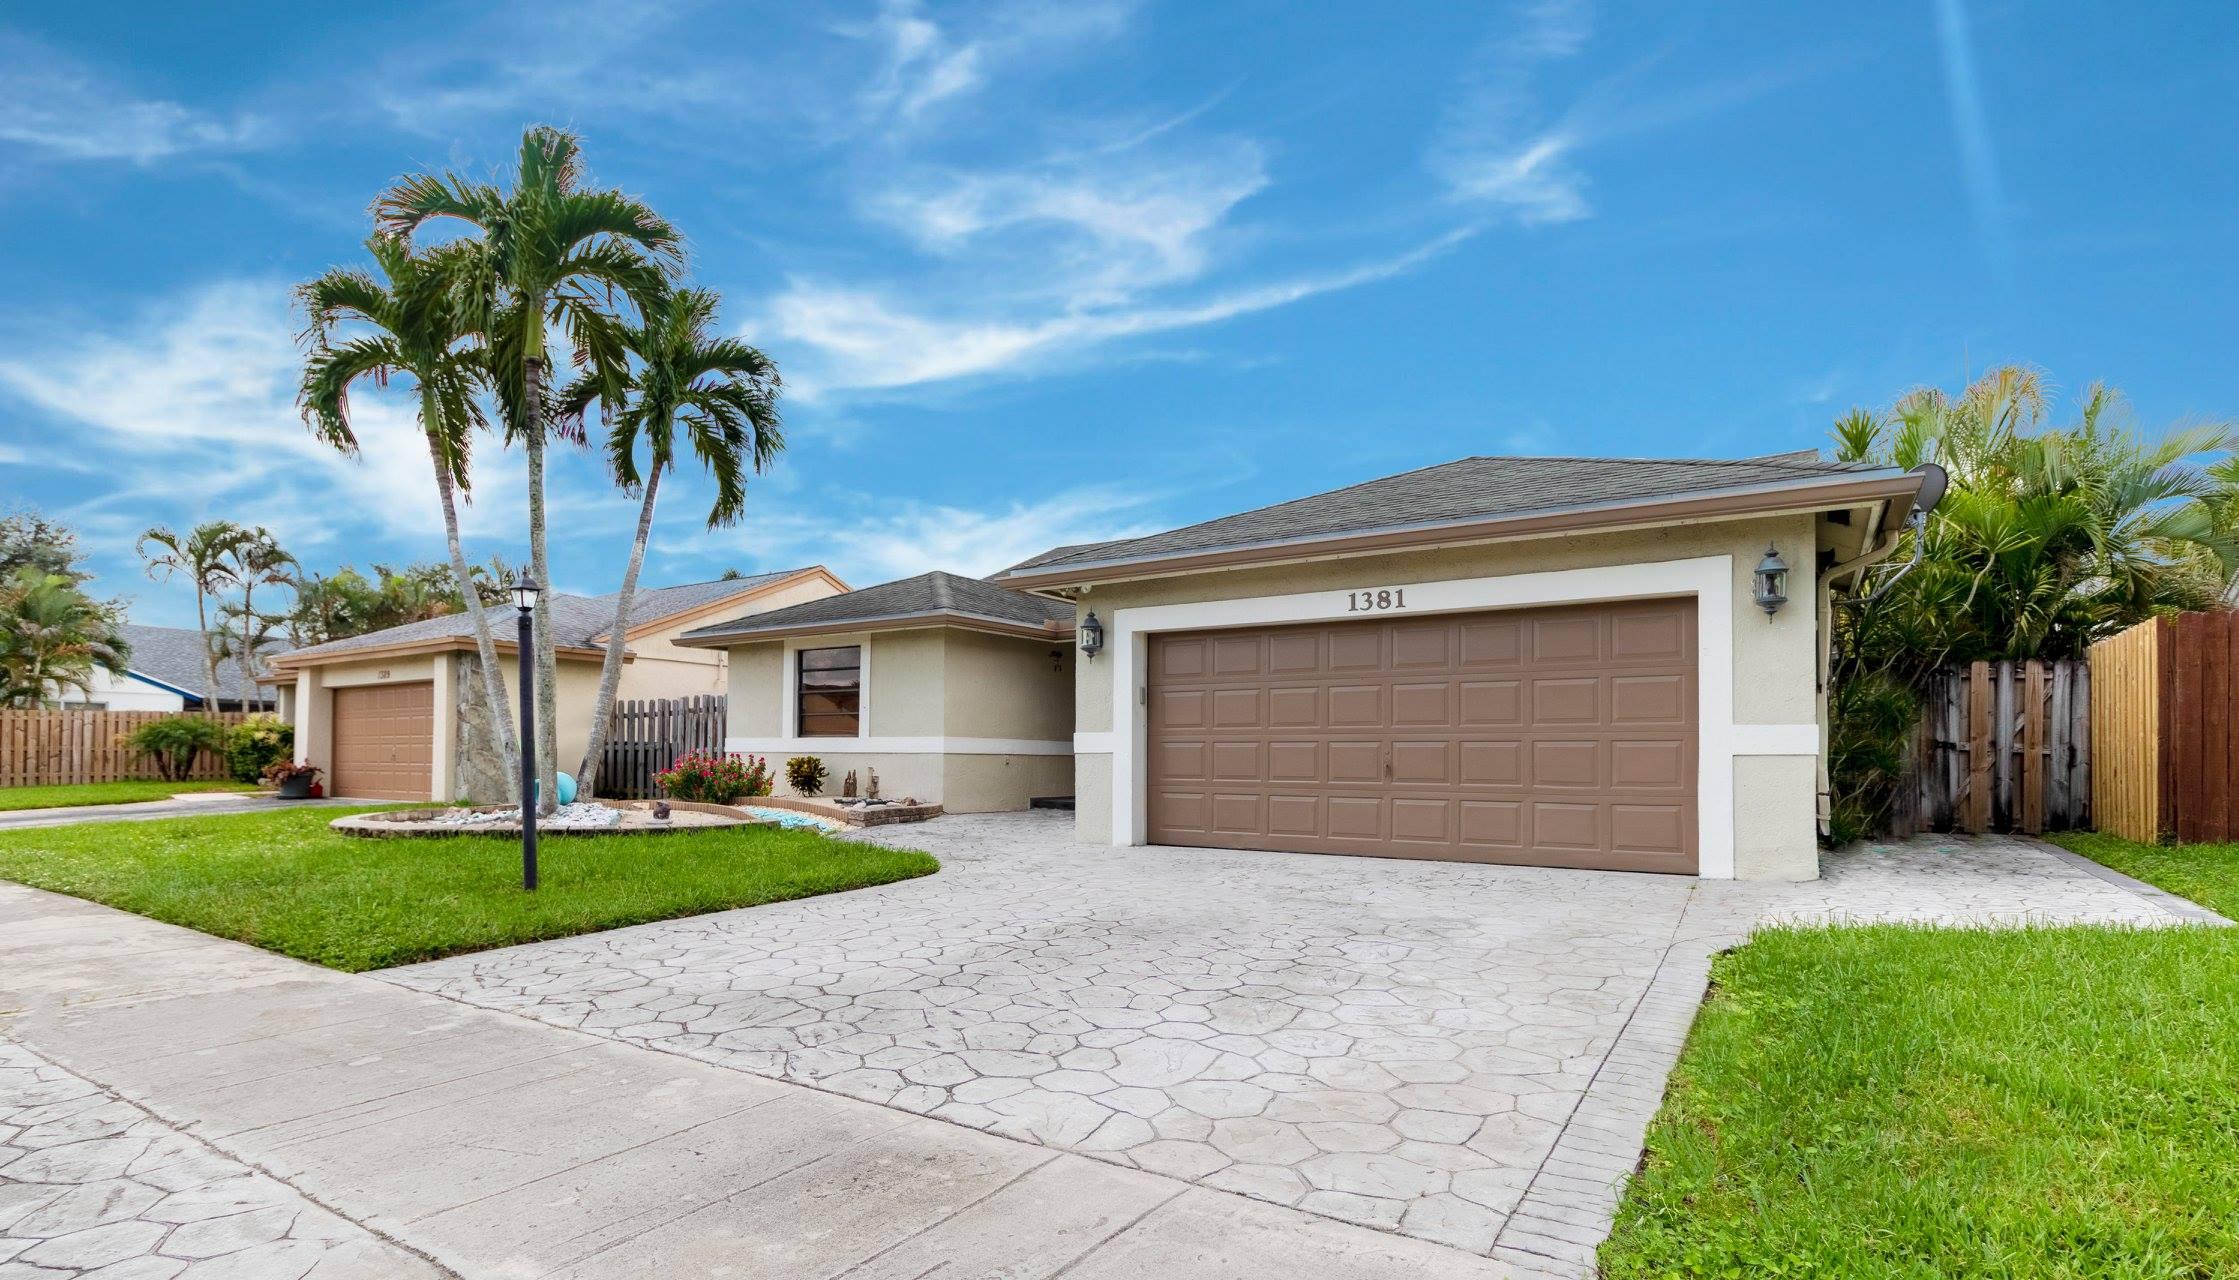 SOLD $395,000 - 1381 SW 151 Avenue, Sunrise FL 33326